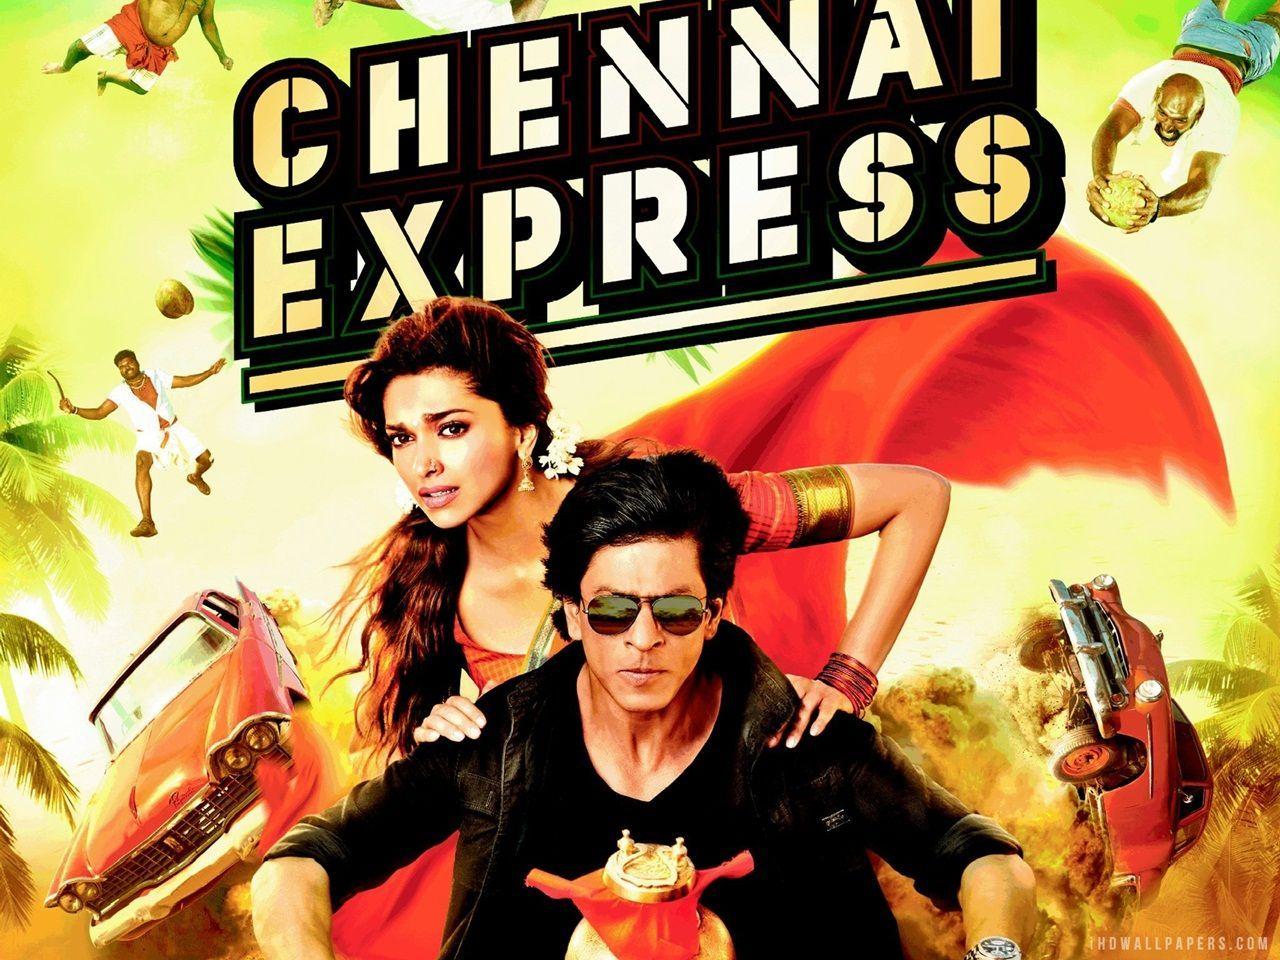 Pin by on Entertainment Chennai express